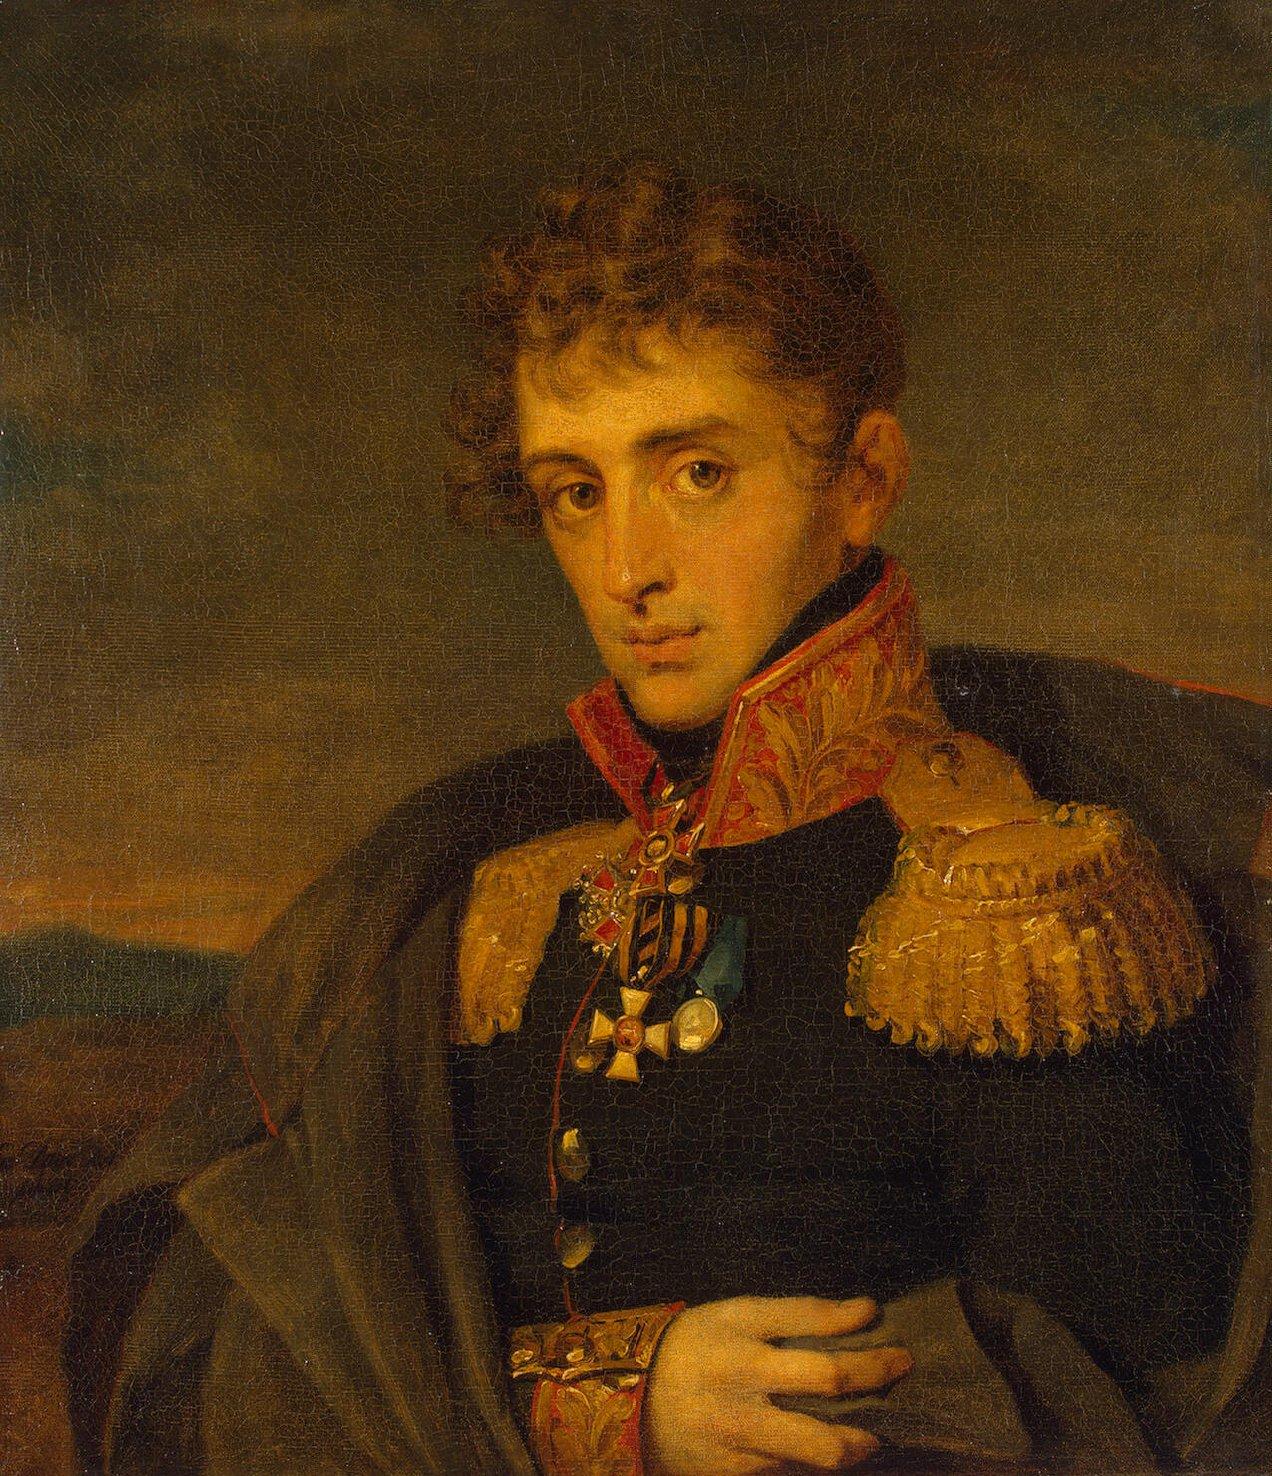 Тучков, Александр Алексеевич